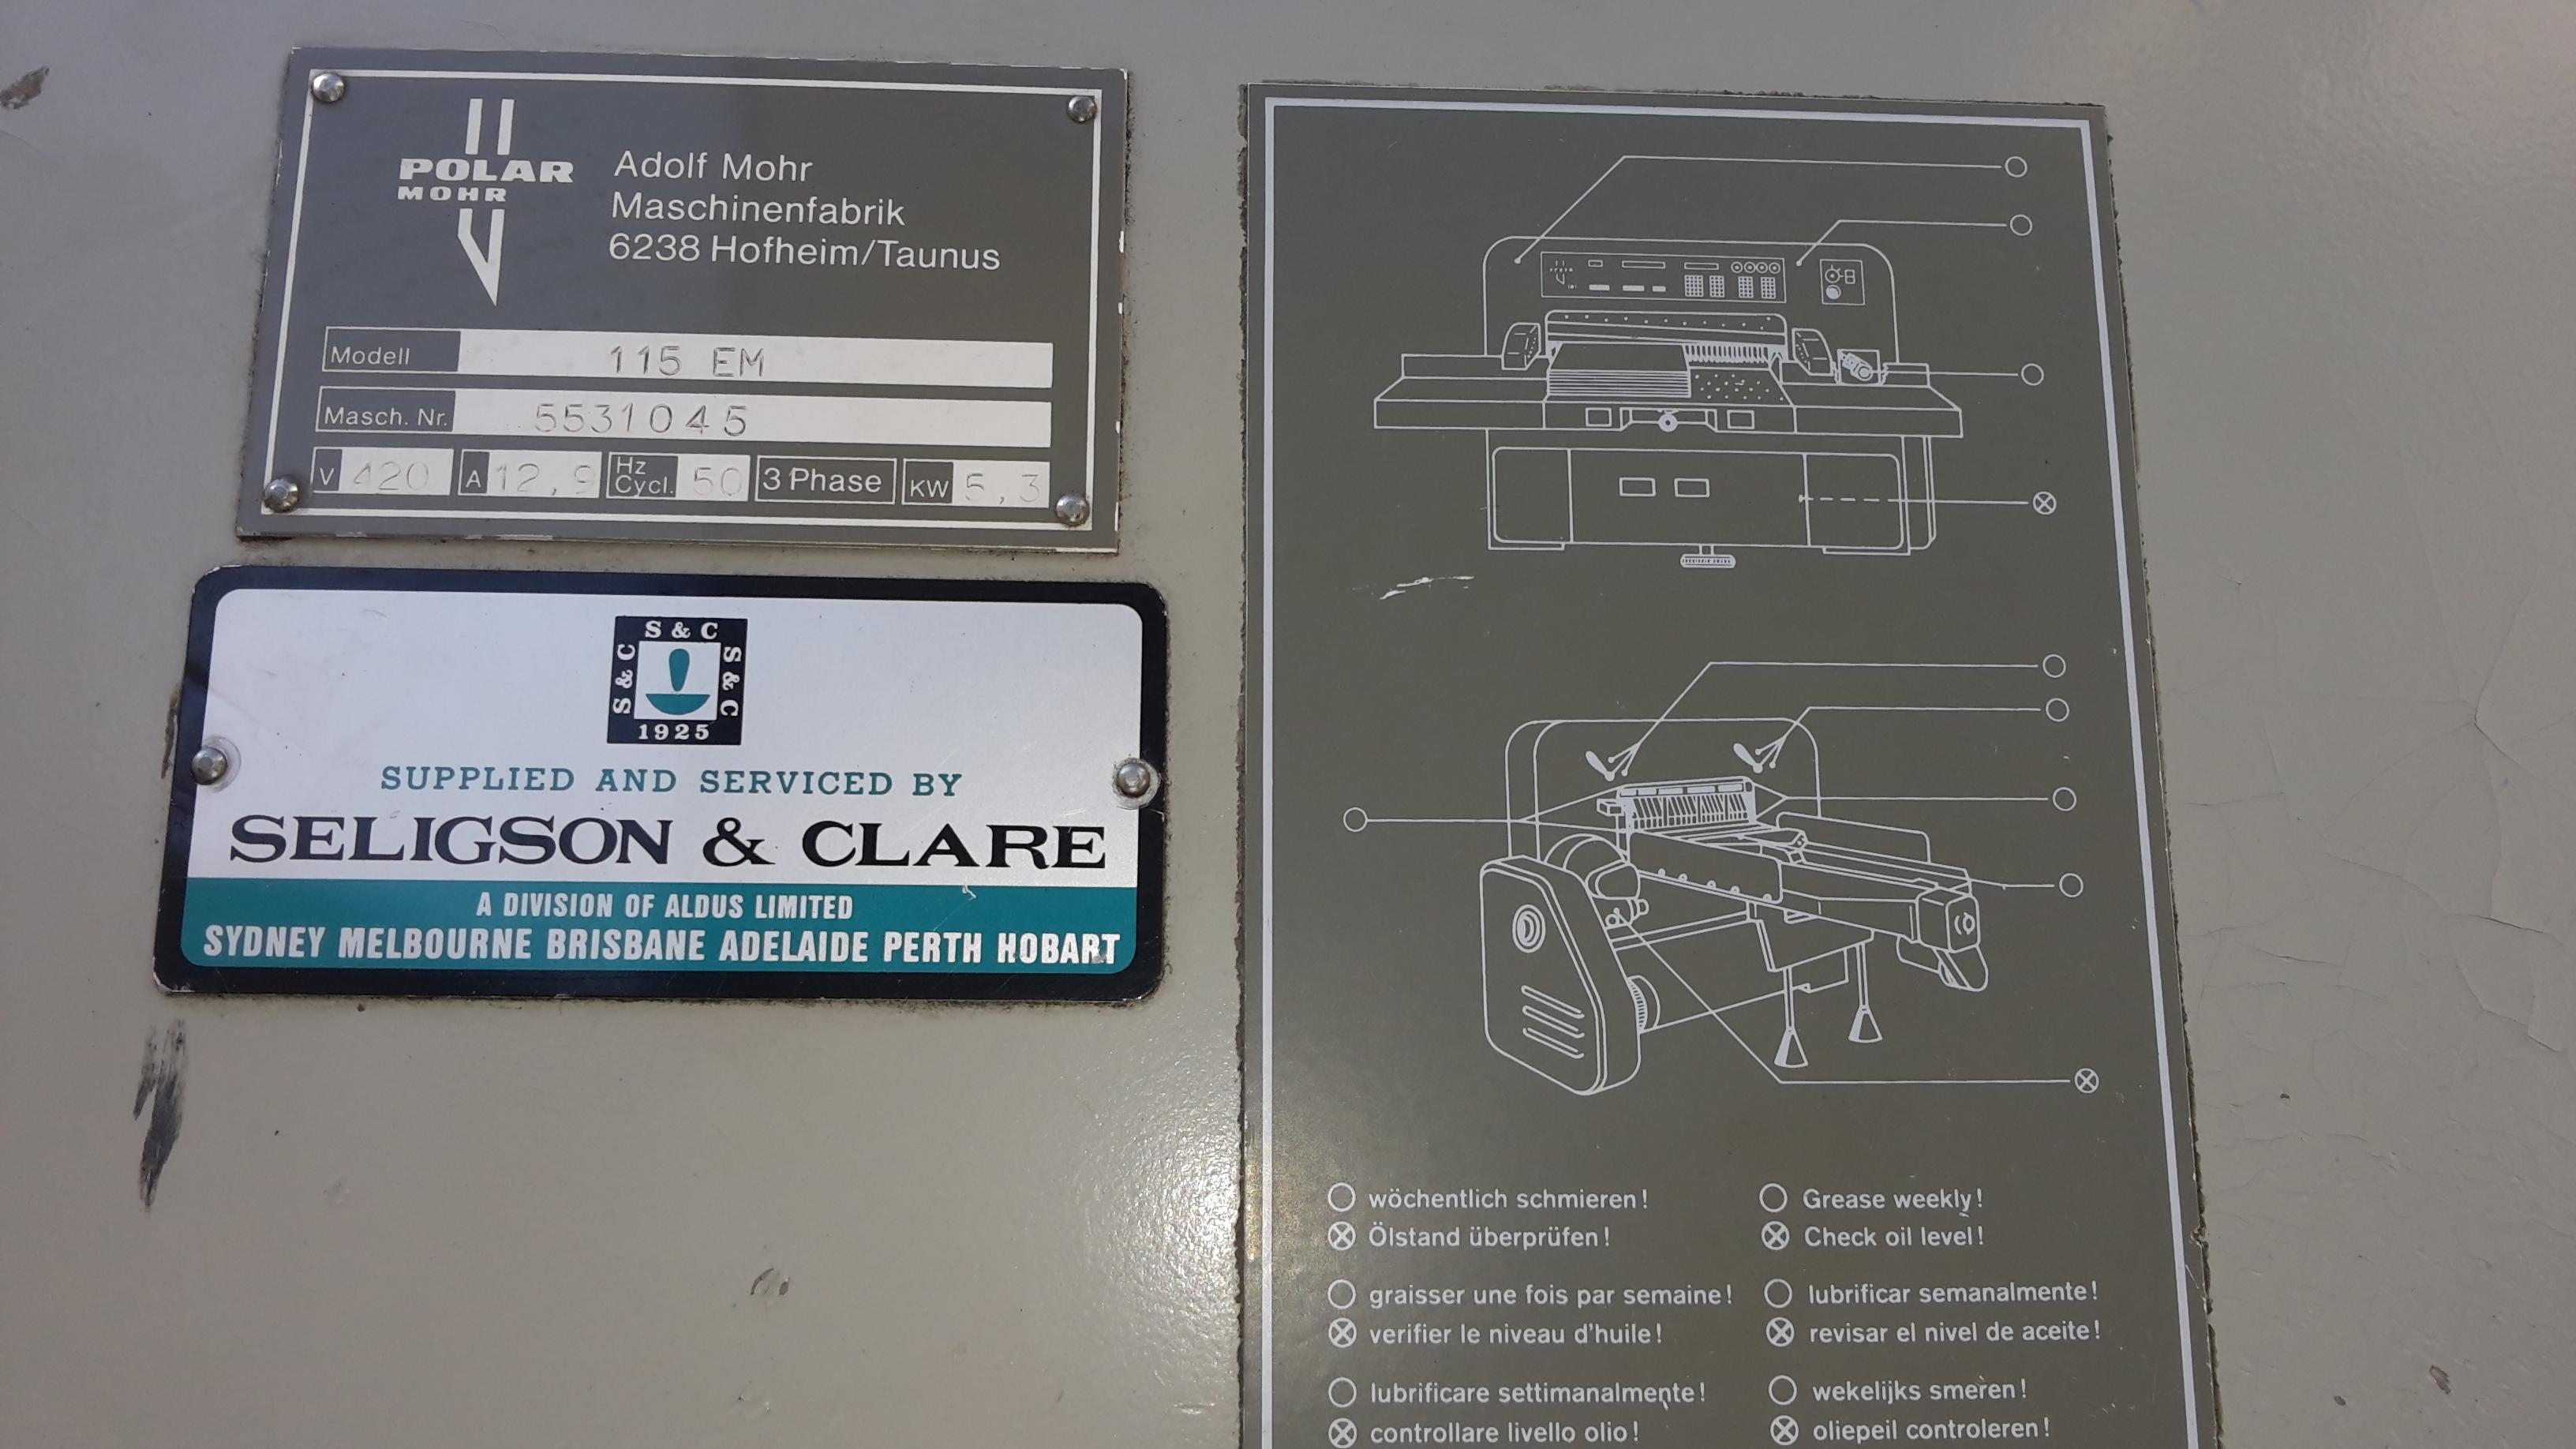 polar machine locations